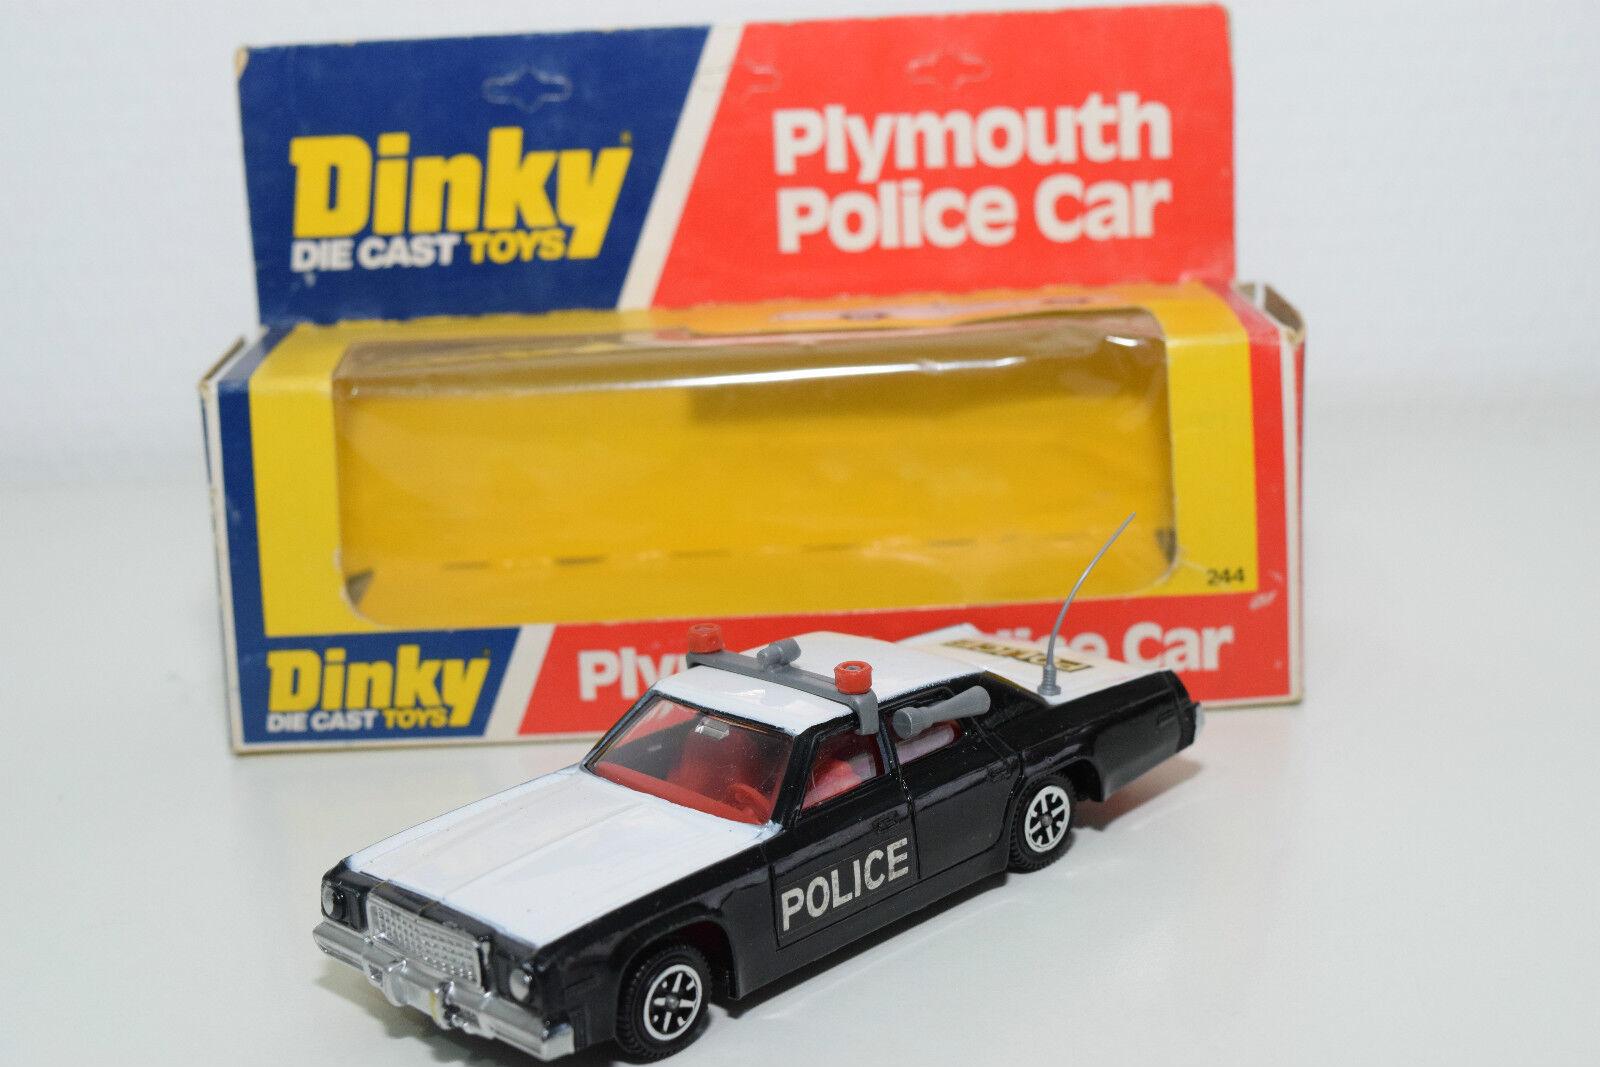 DINKY TOYS 244 PLYMOUTH POLICE CAR CAR CAR MINT BOXED c97c0c